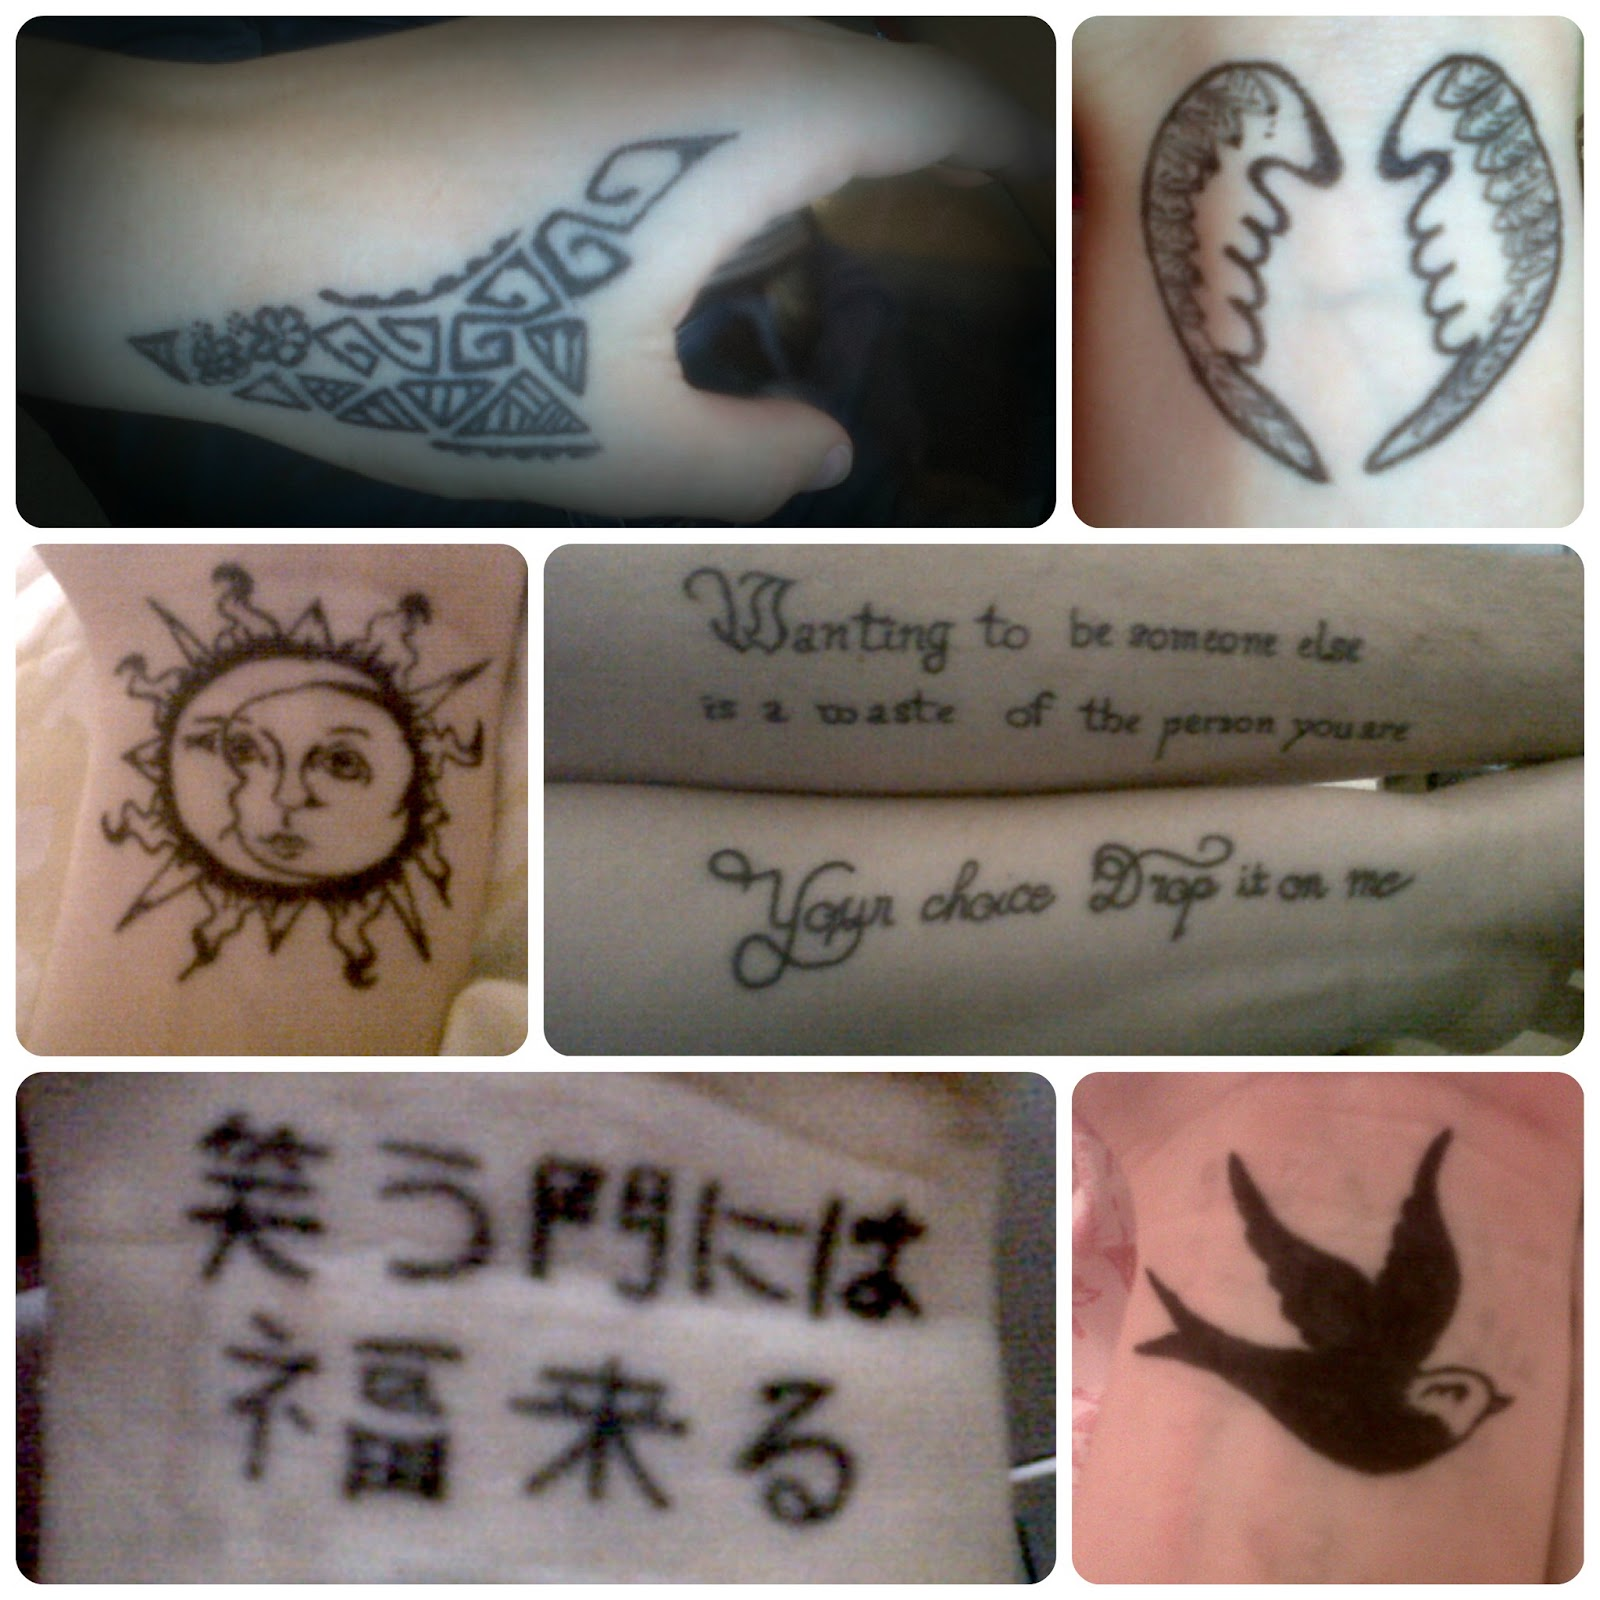 tatouage ephemere poignet - Se faire un tatouage éphémère au poignet Tatouage Poignet